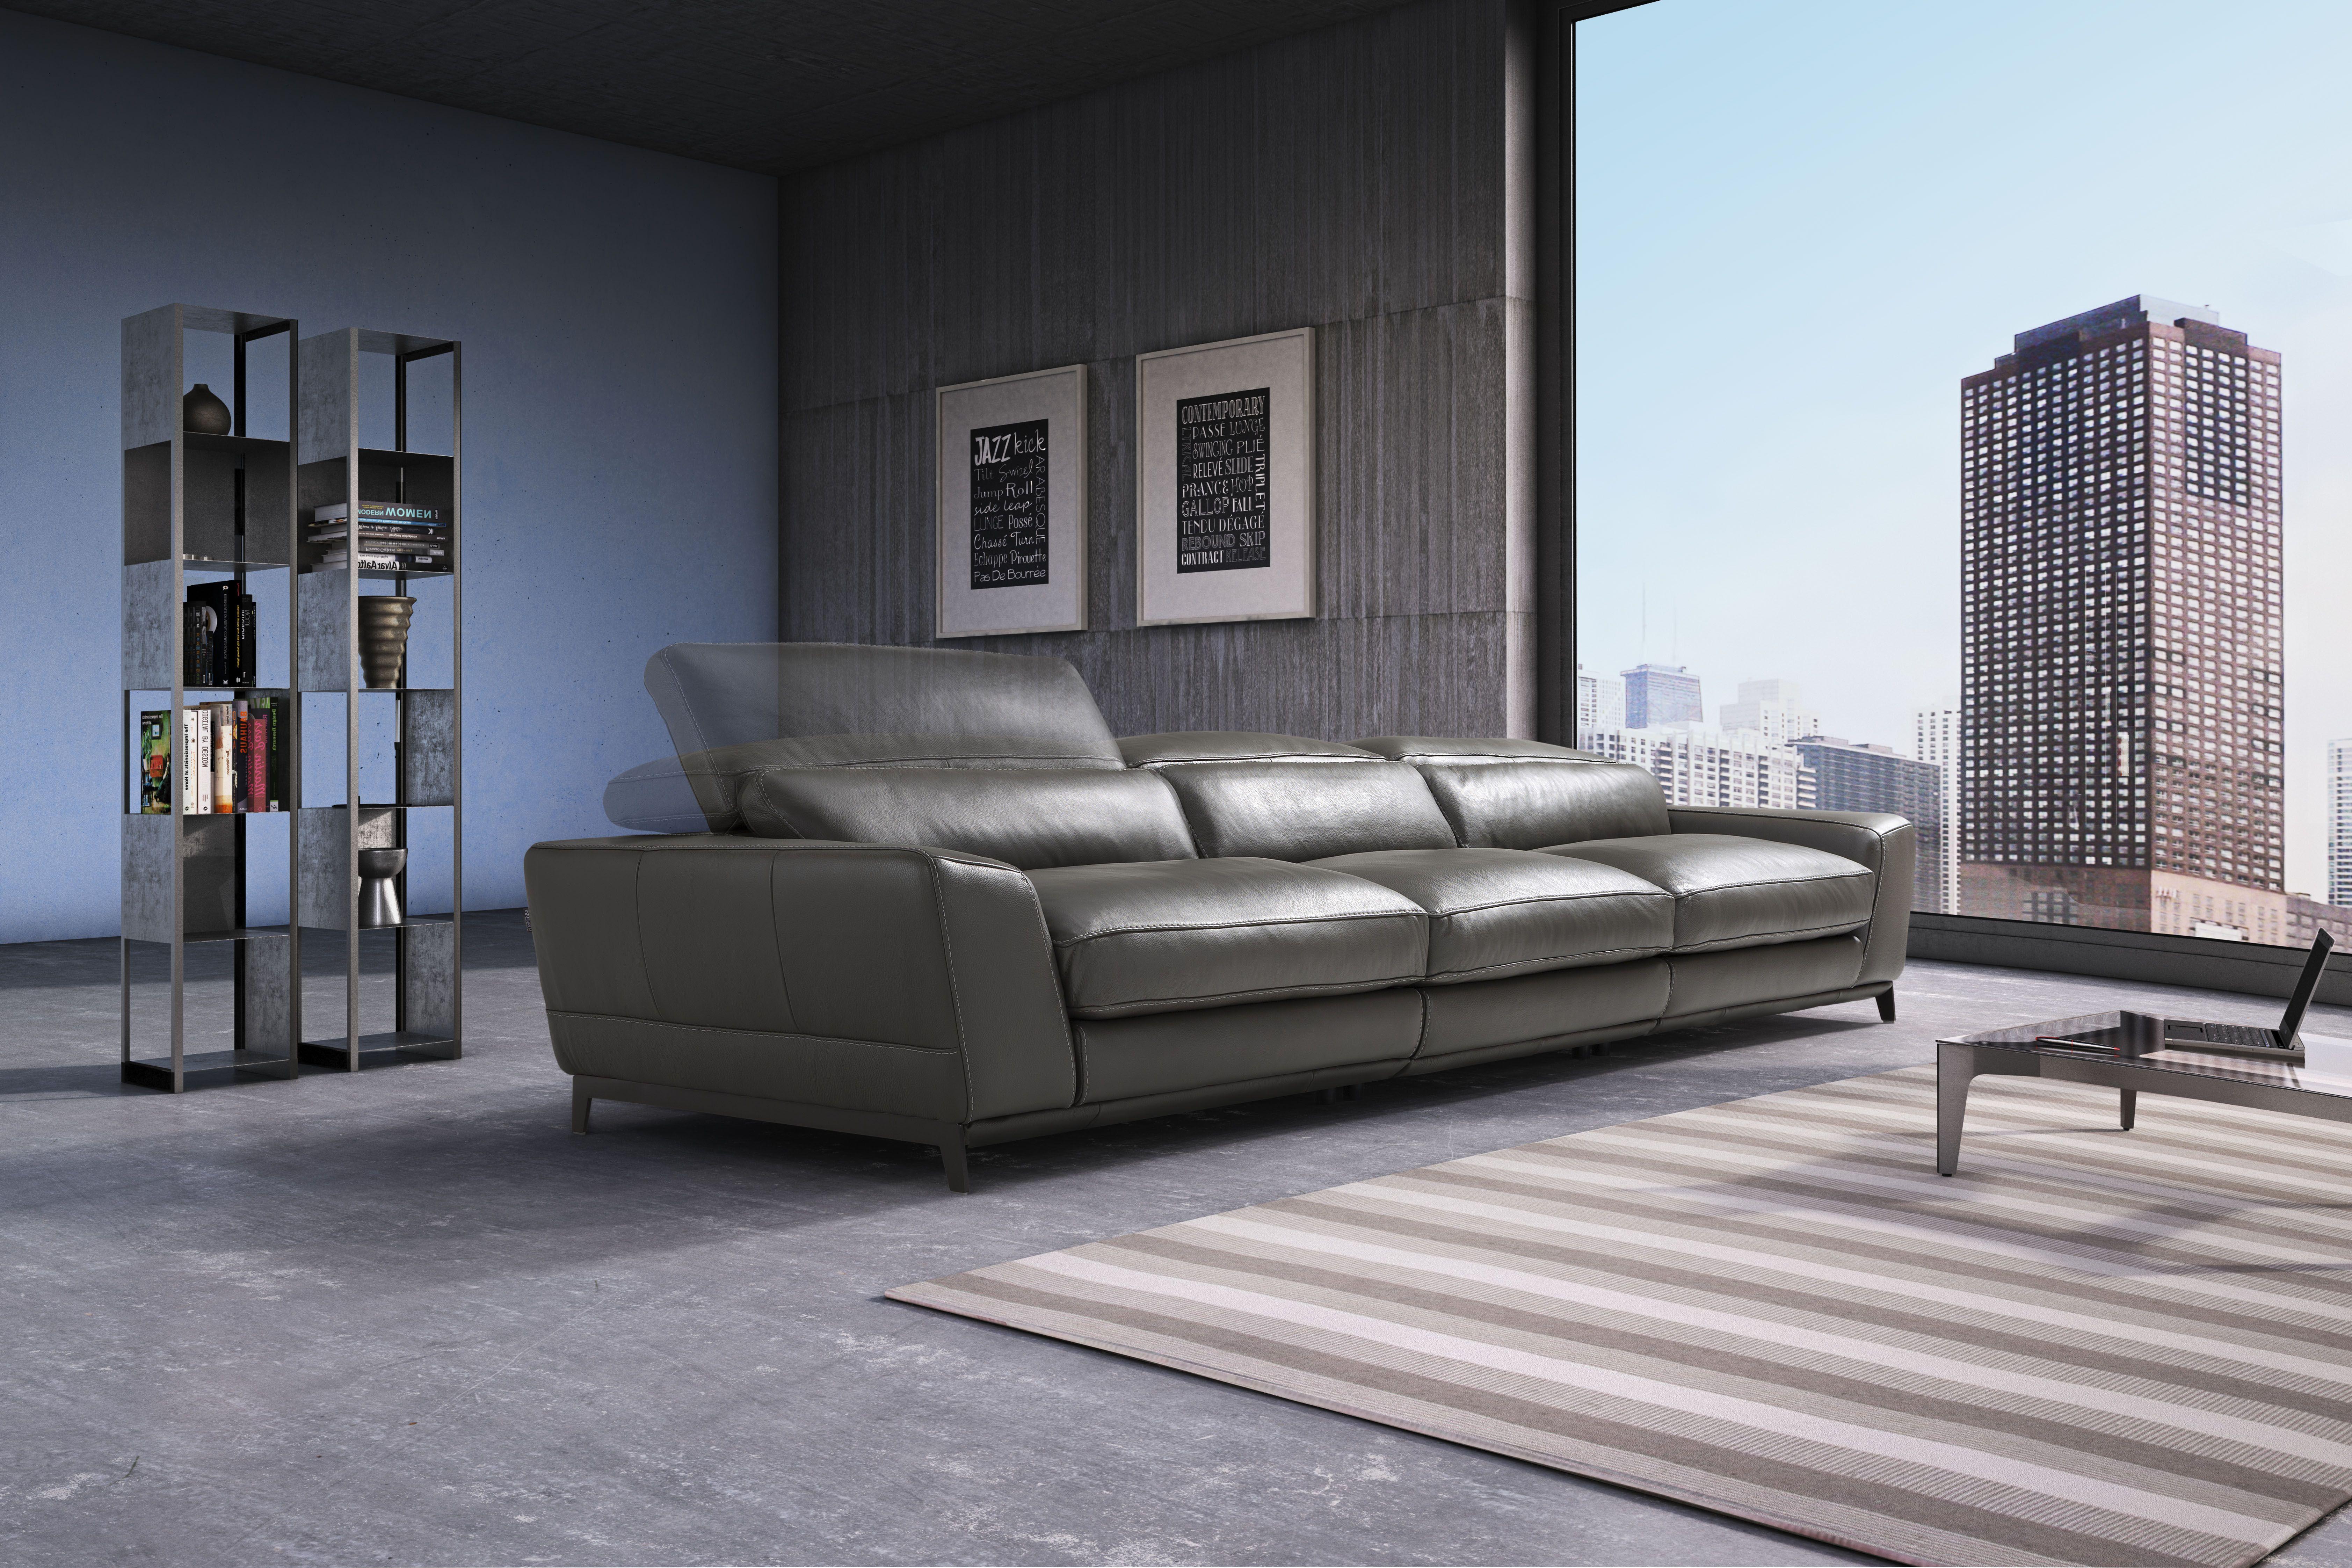 Ecointeriors Ecoexclusive Egoitaliano Couch Italian Design Dublin Santry Dunlaoghaire With Images Interior Design Design Home Decor